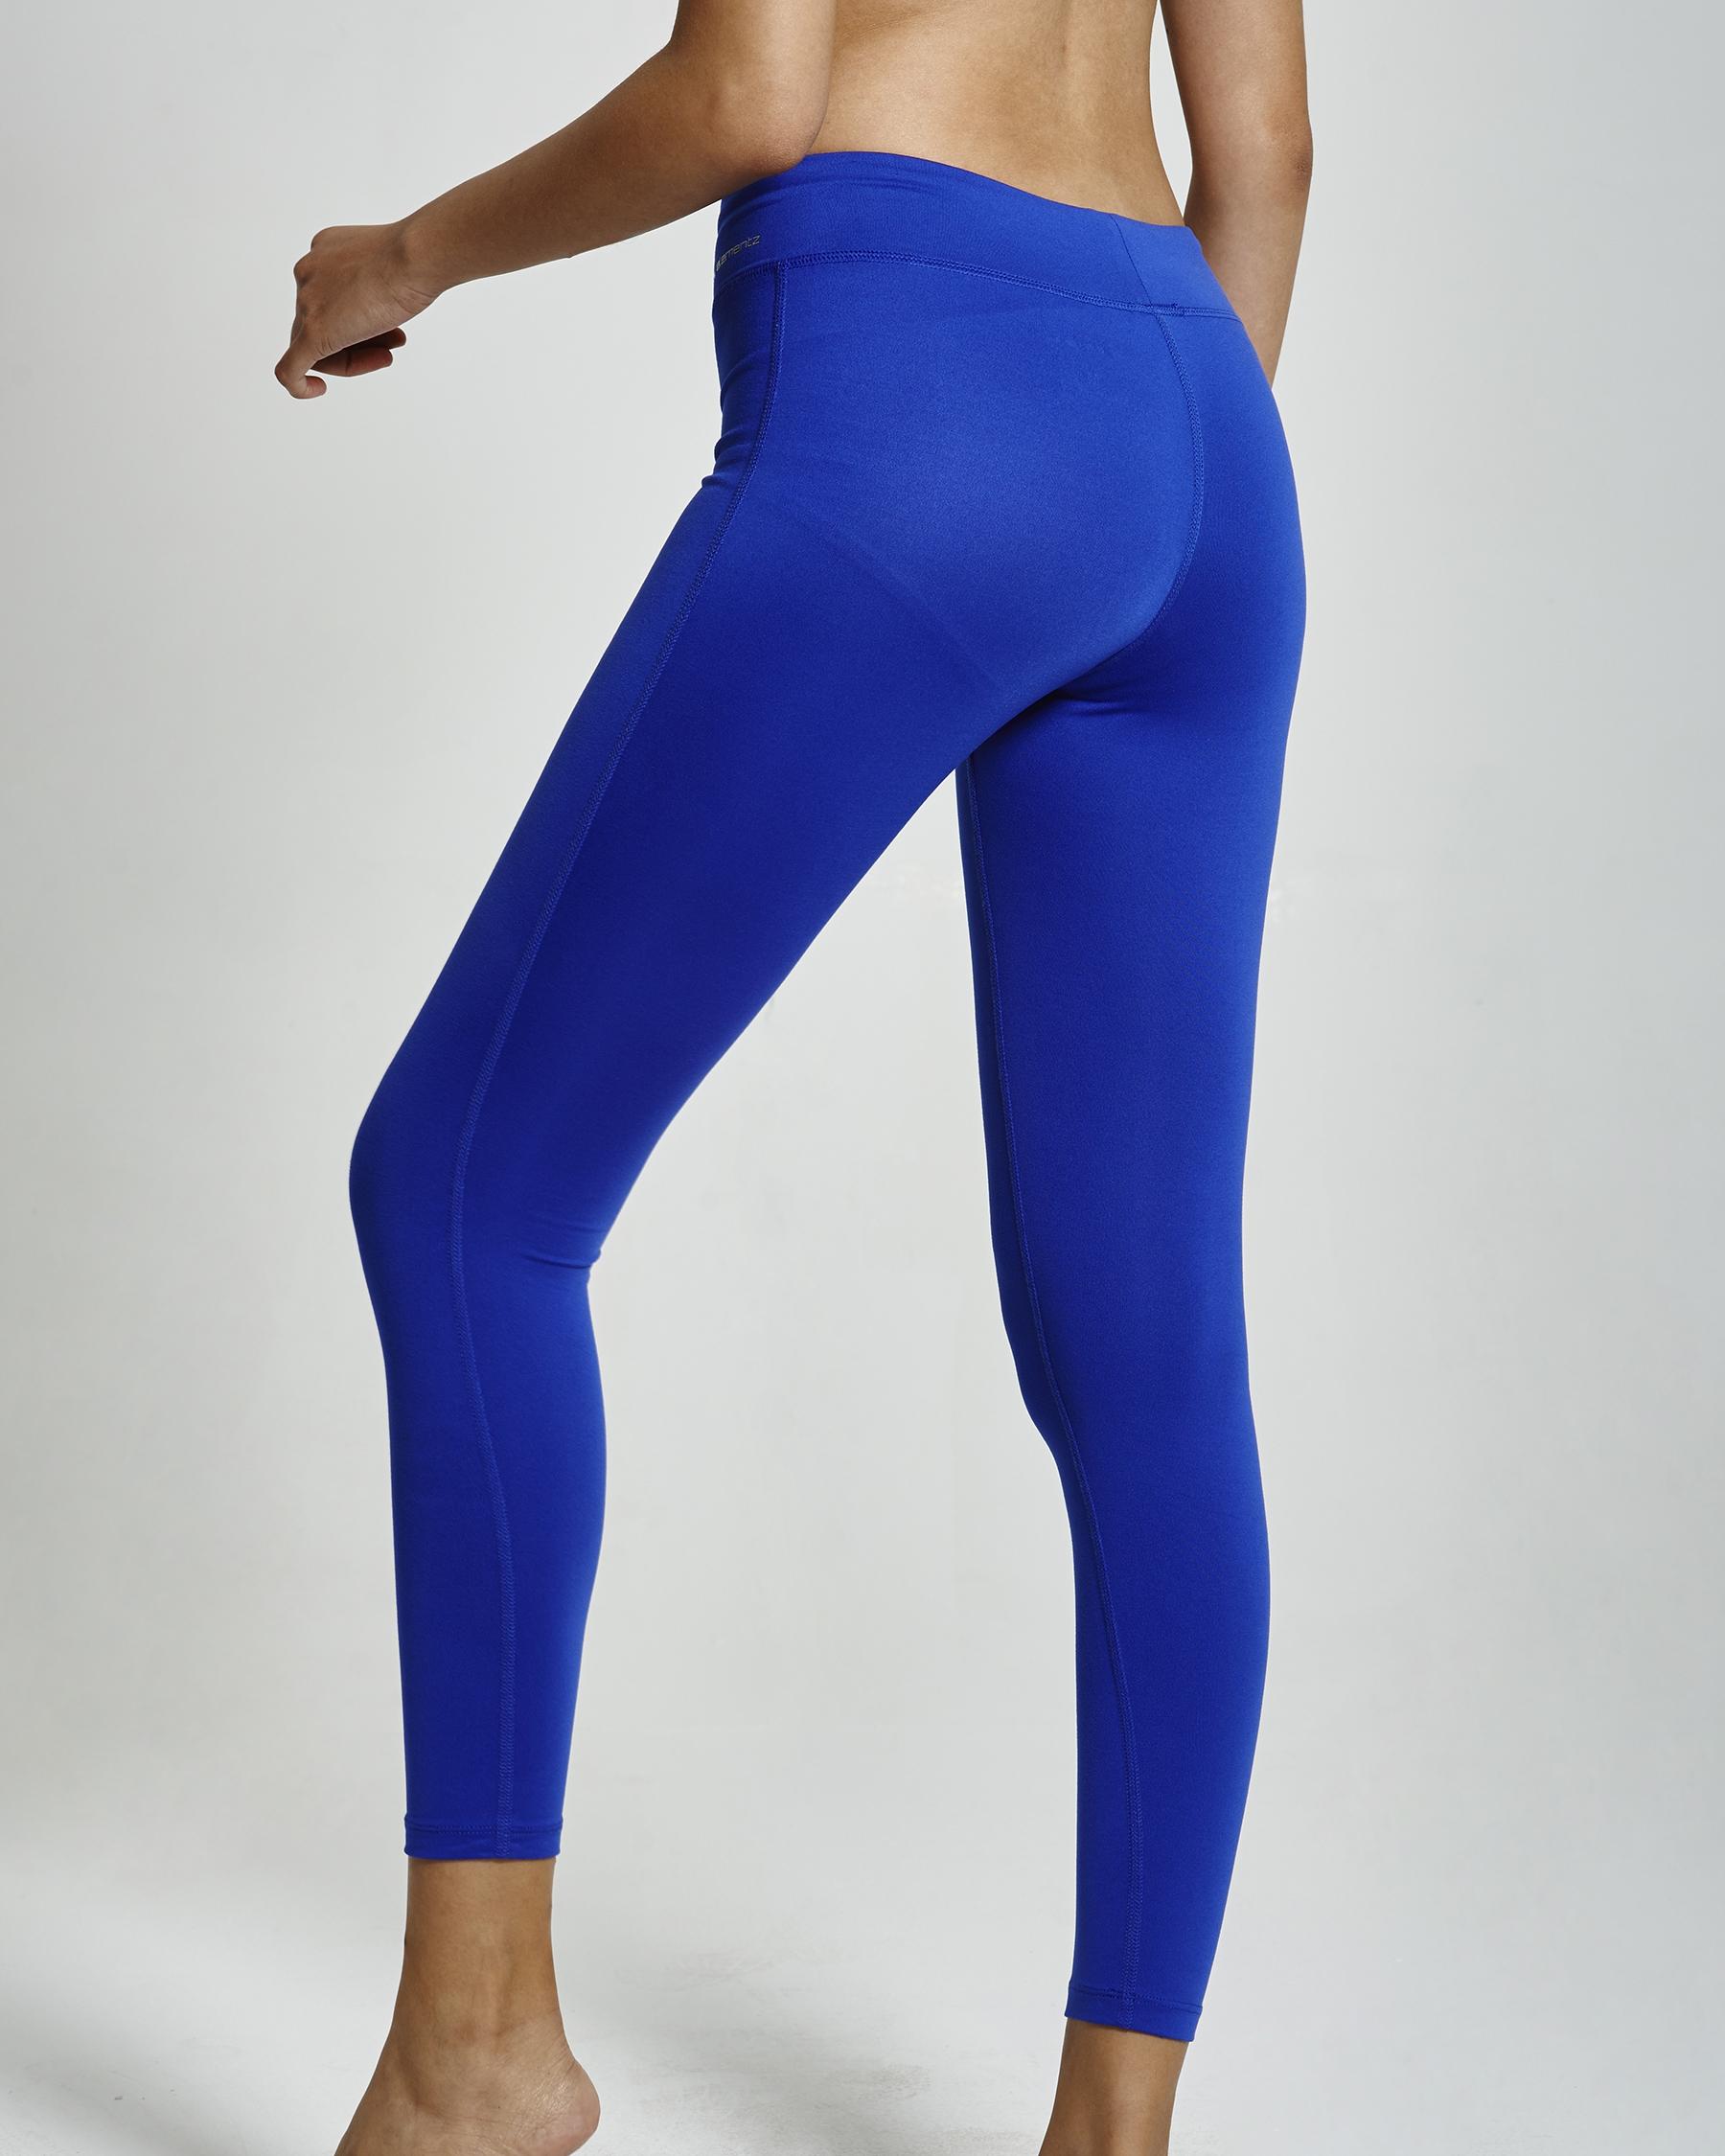 Breath Lifted Yoga Pants (Blue)